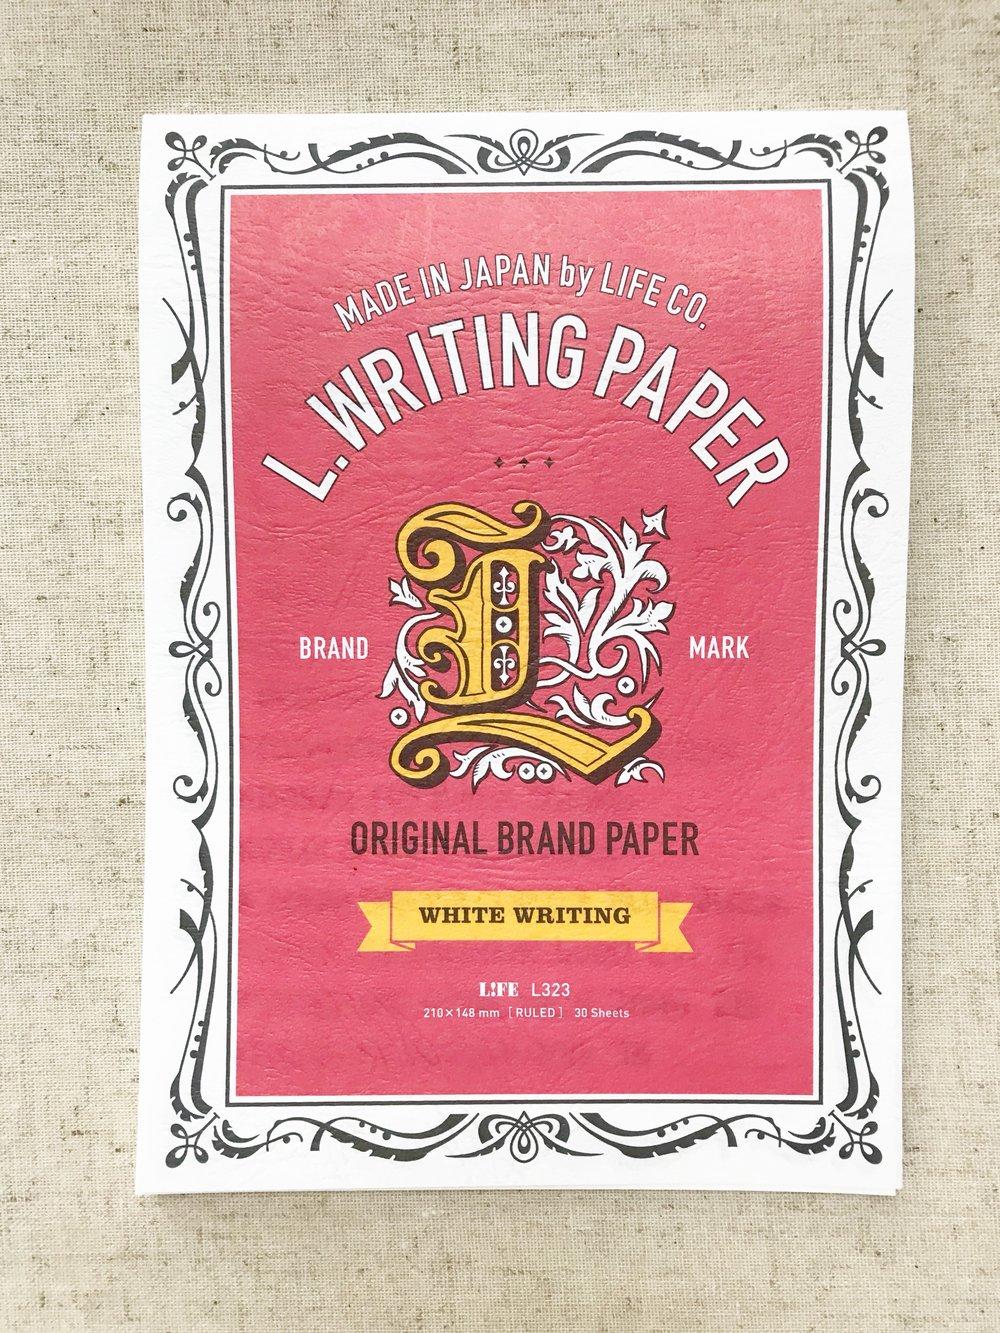 life-co-white-writing-2.JPG